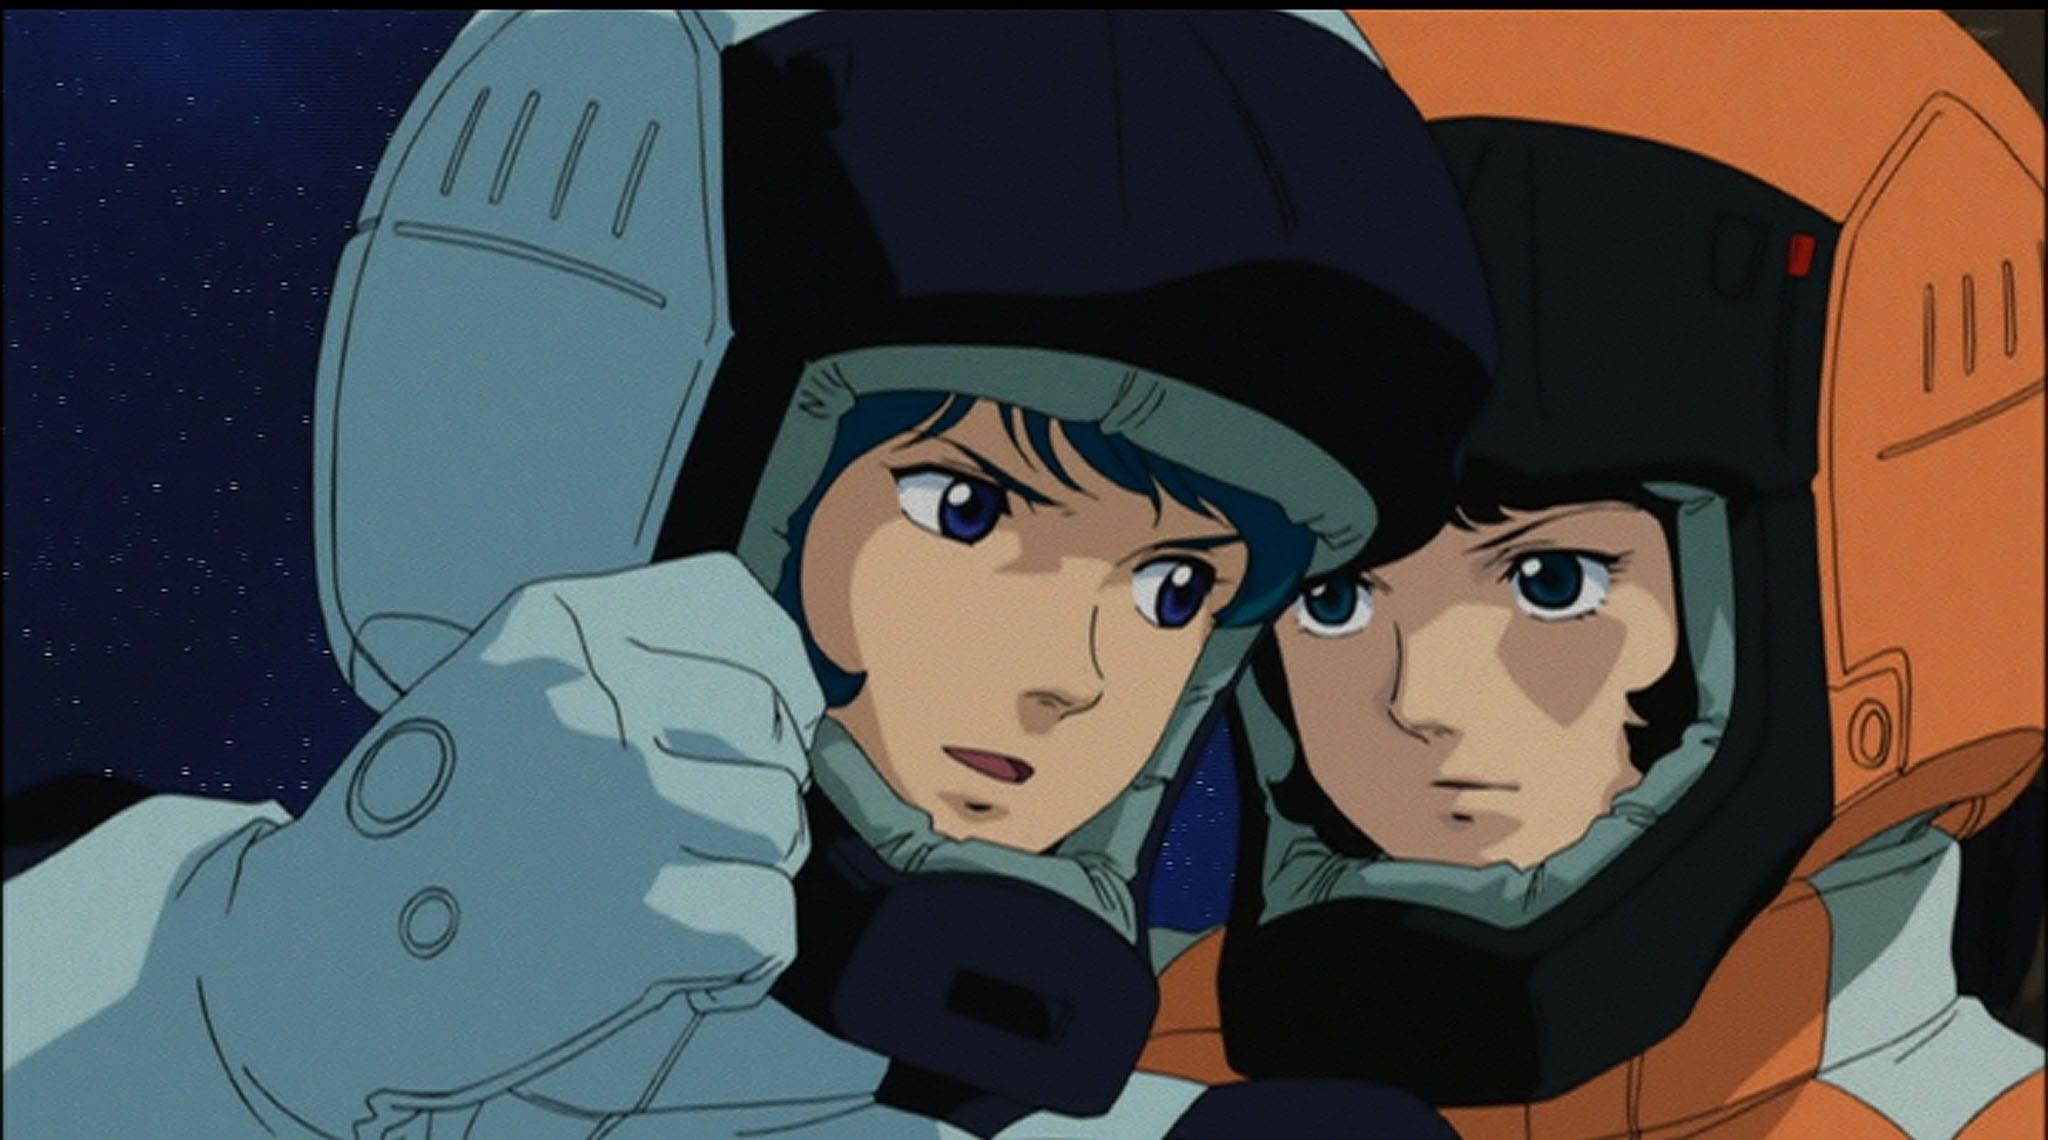 80s anime, Mobile Suit Zeta Gundam